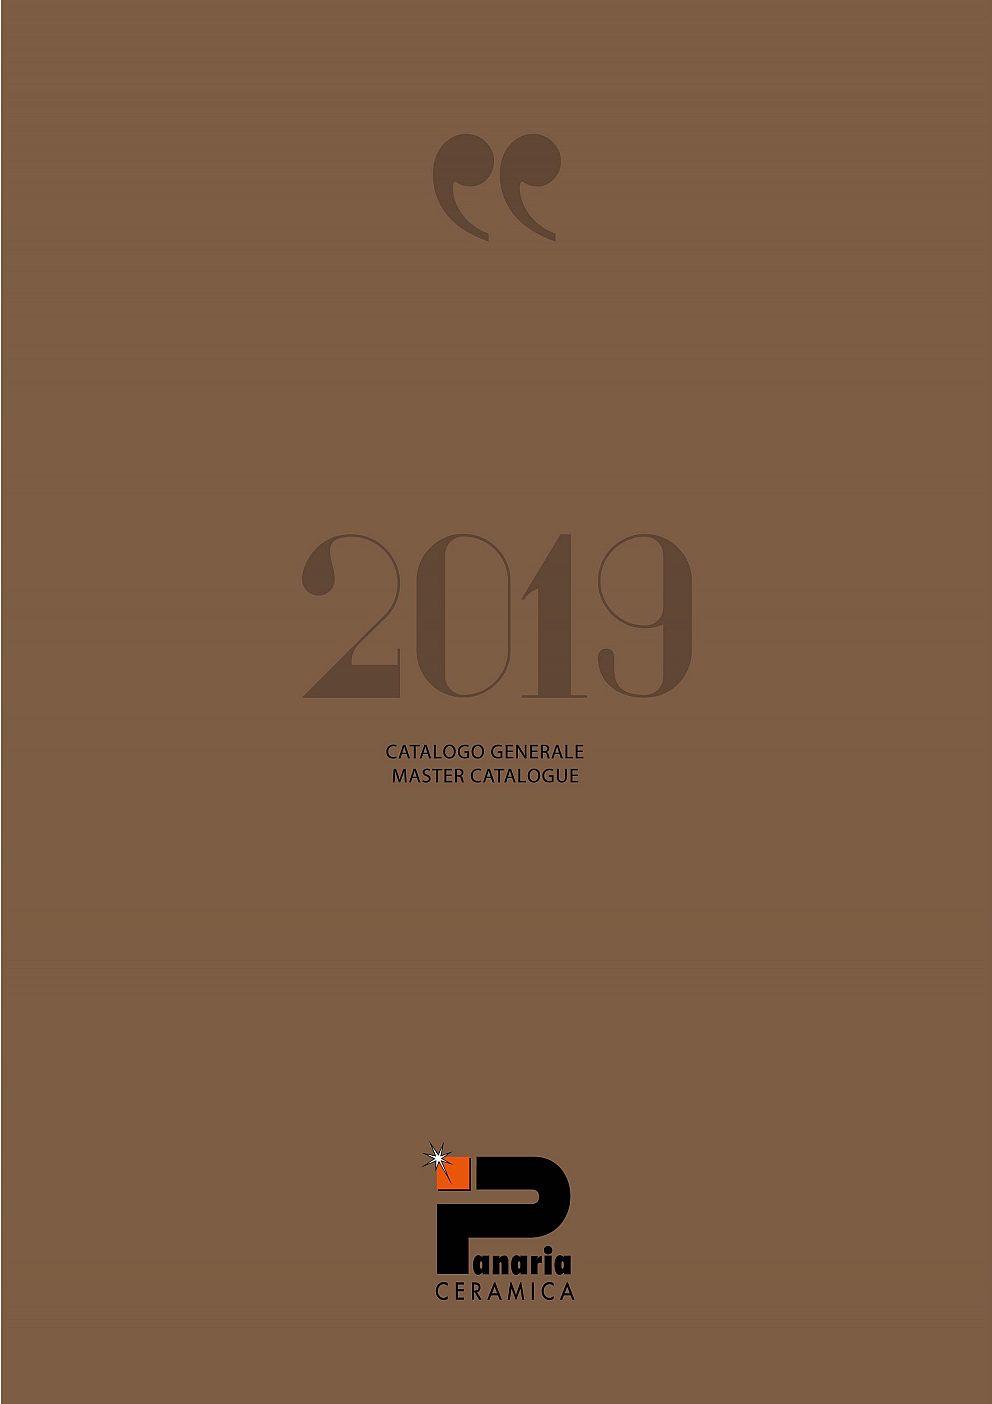 Panaria - Generálny katalóg 2019